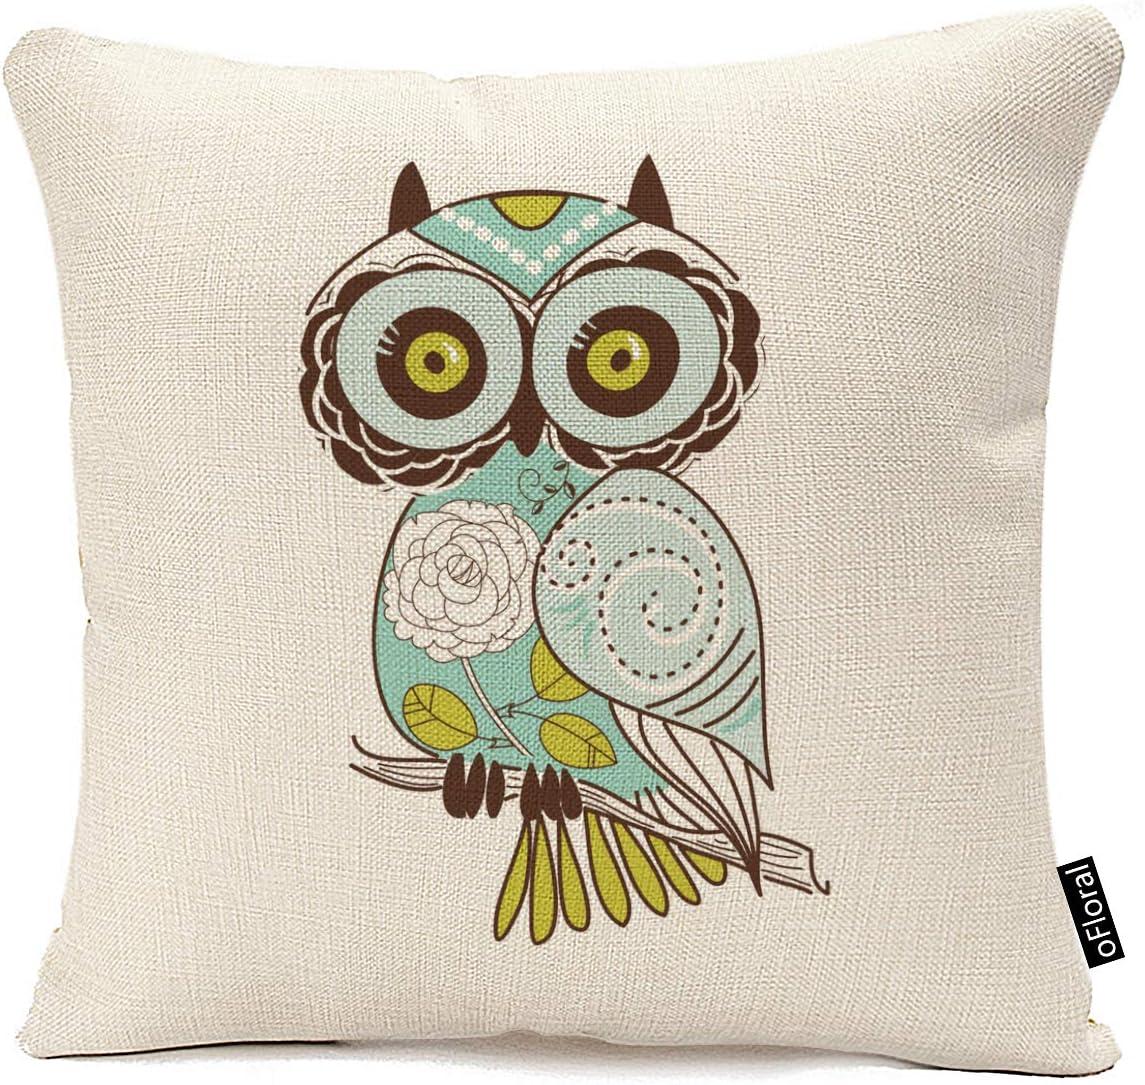 Amazon Com Ofloral Square Decorative Throw Pillow Case Cushion Cover Cartoon Green Cute Cartoon Owl 18 X18 Cotton Linen Home Sofa Pillow Cover Home Kitchen